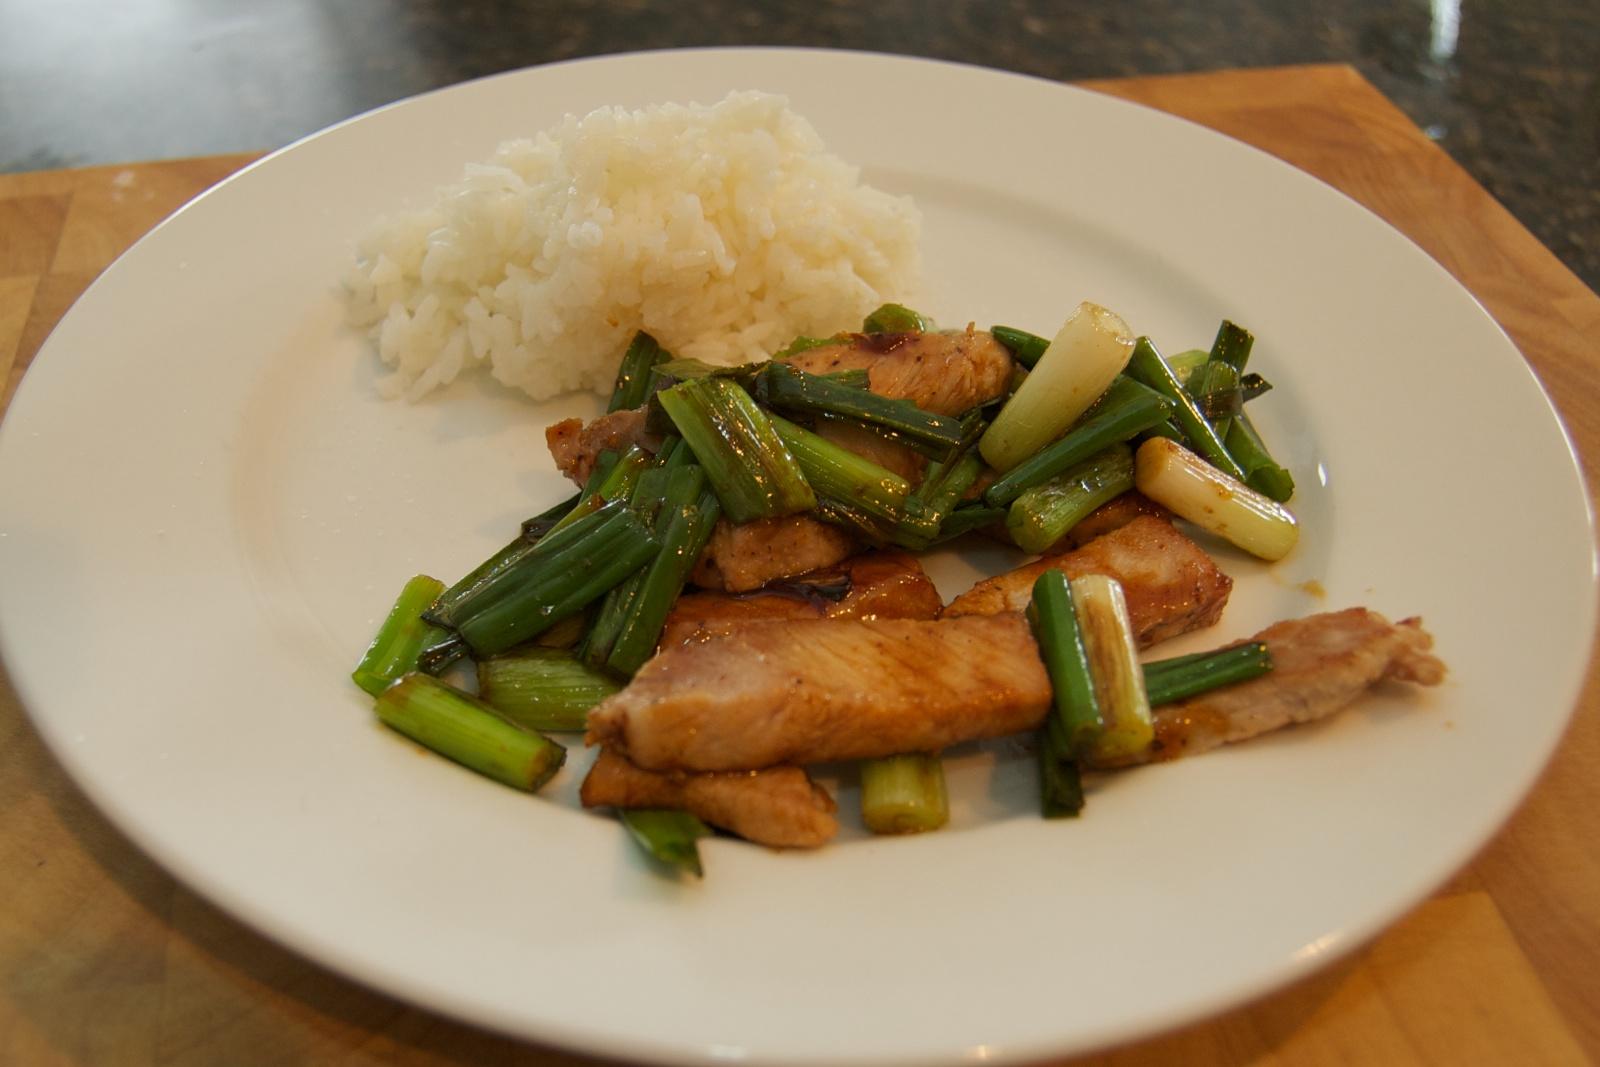 http://blog.rickk.com/food/2010/10/29/ate.20101029.l.jpg